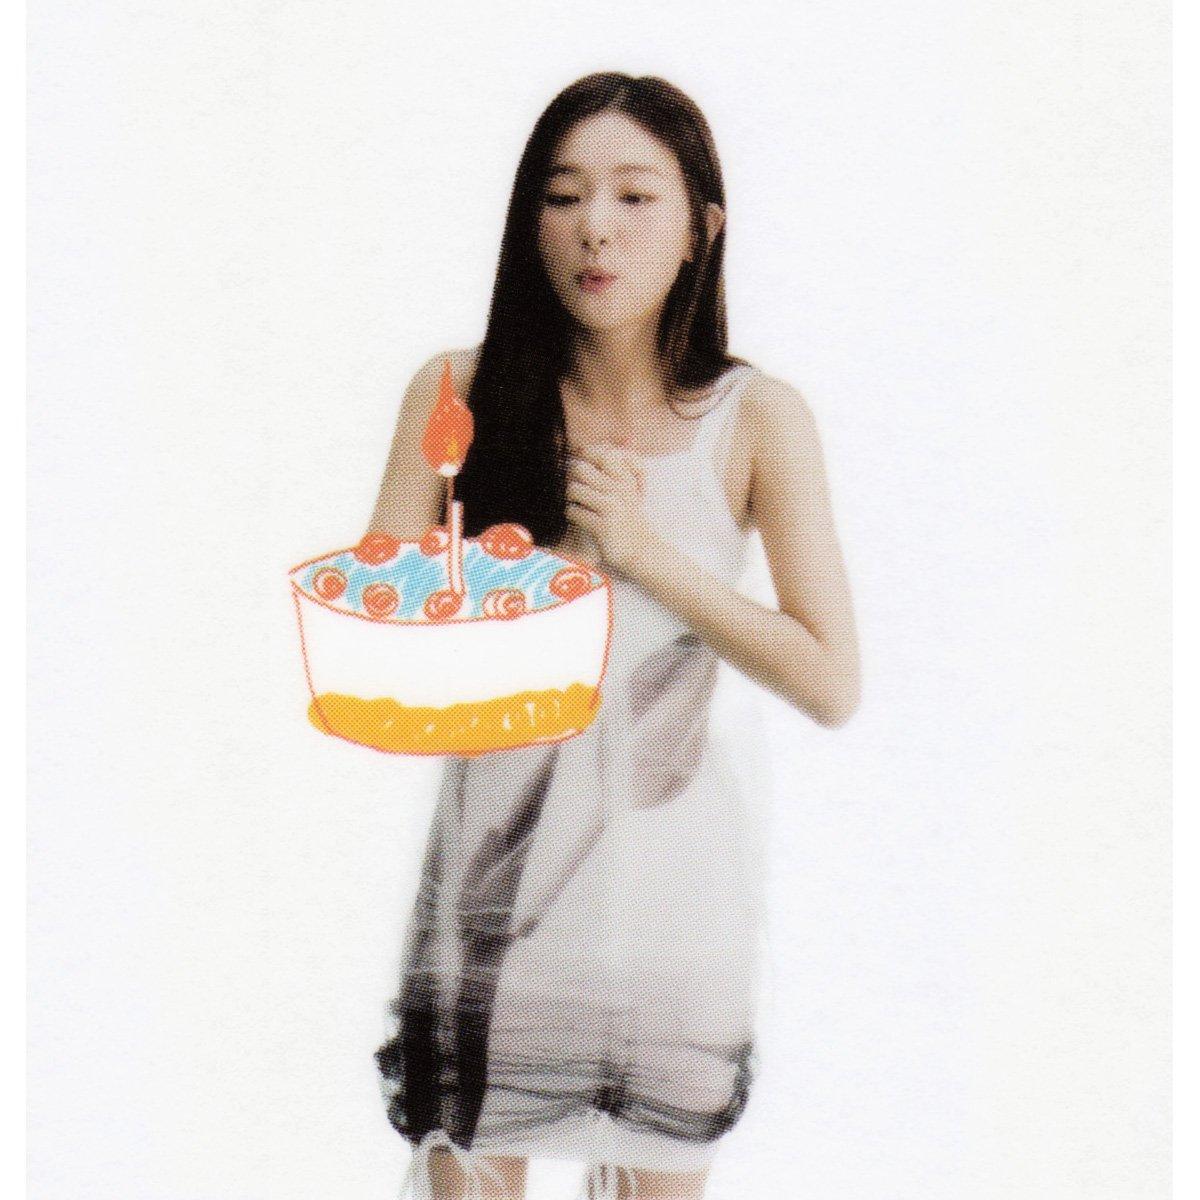 RT @sgsgom: #HiSeulgiDay #HappySeulgiDay #210210_두배_행복한_슬탄절 https://t.co/ipseqt0Gyt